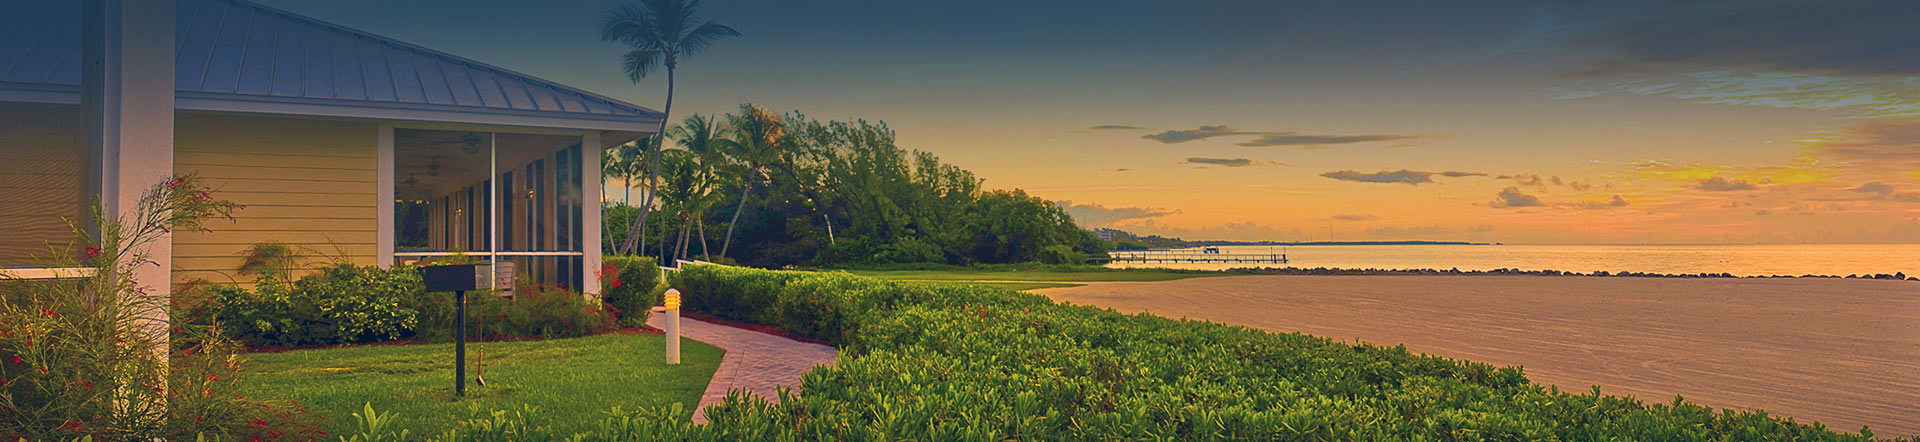 area-info-Islander-Luxury-Villa-&-bushes-II